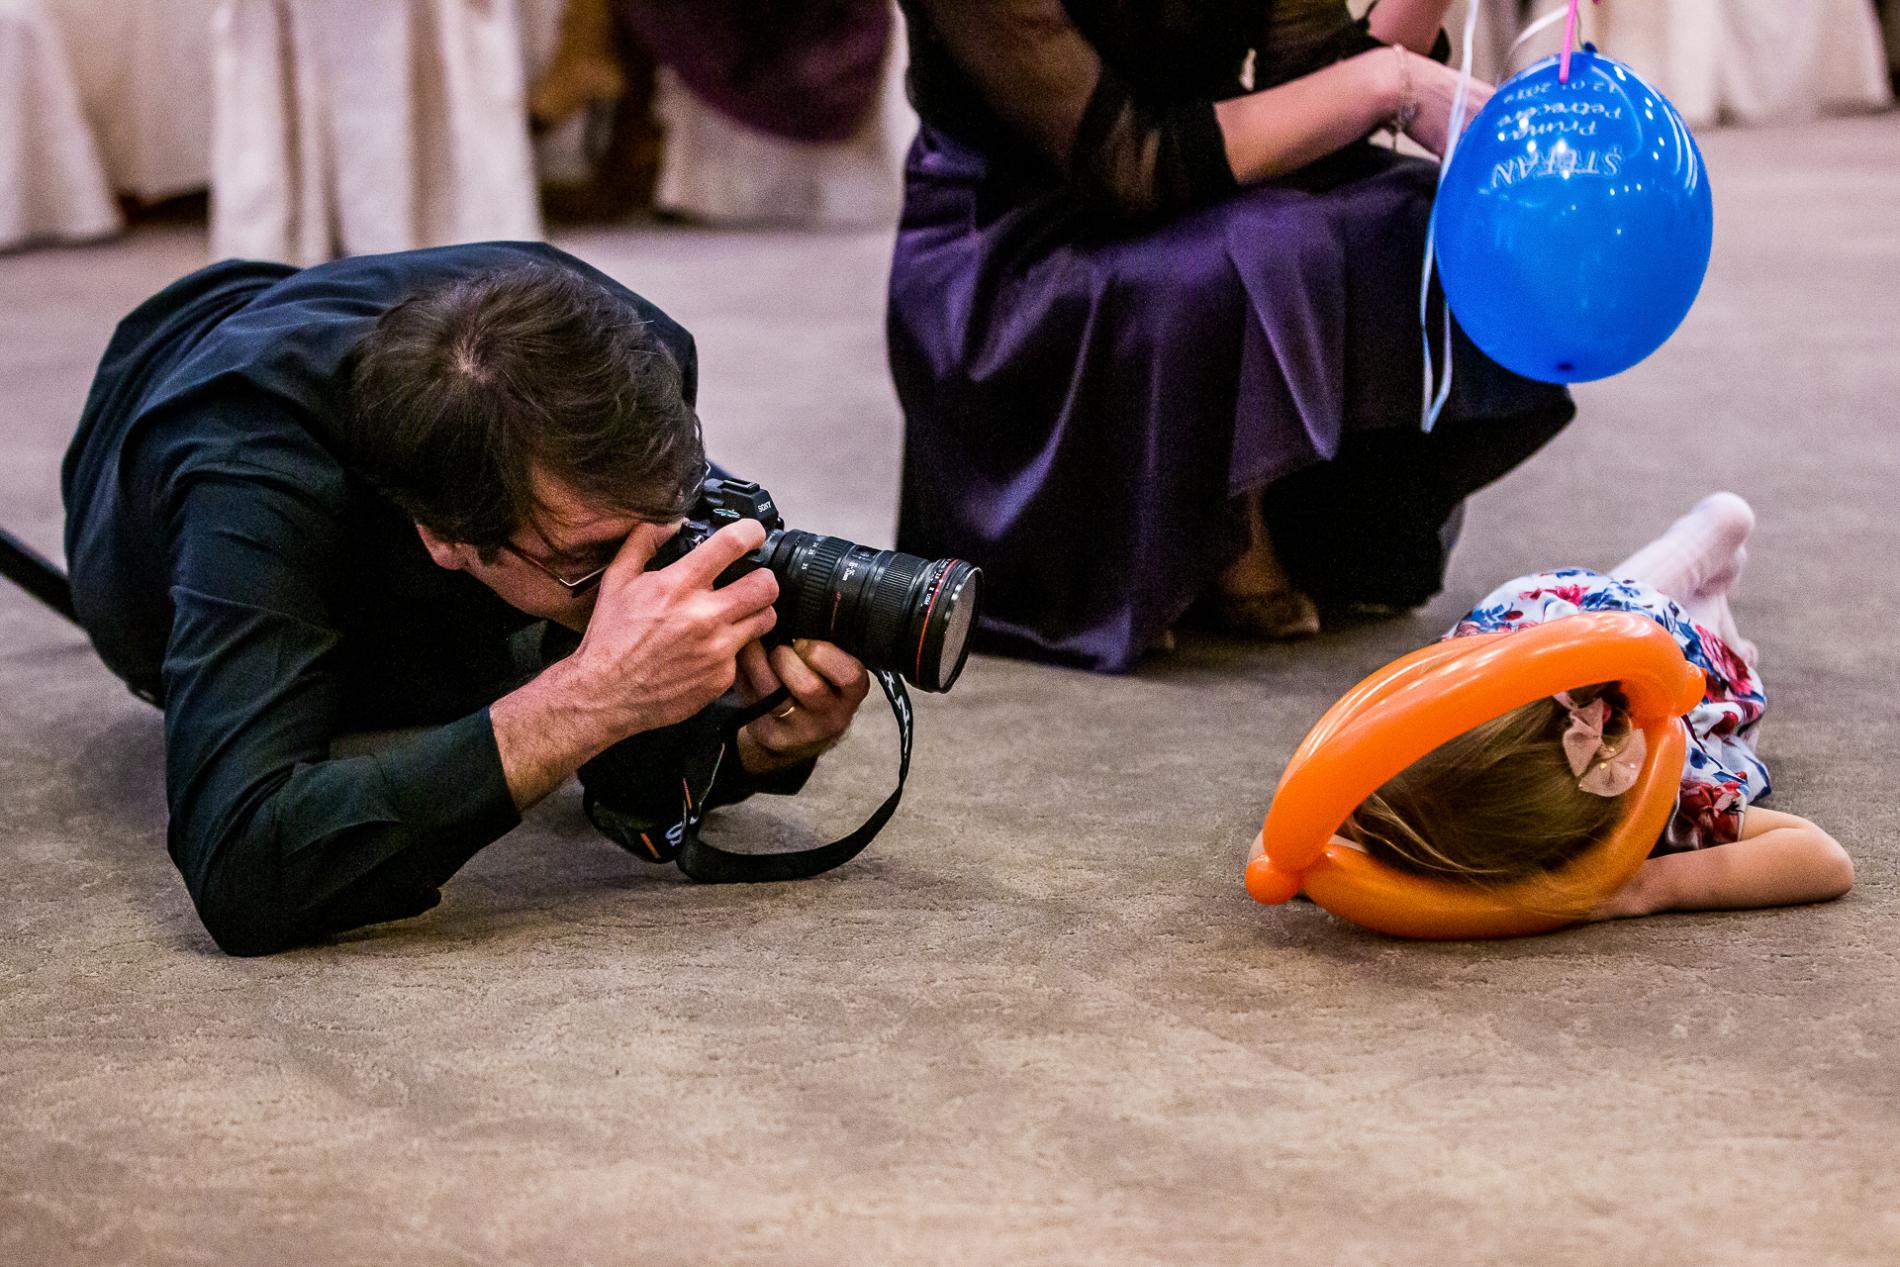 Romania wedding venue photographer - Mihai Zaharia